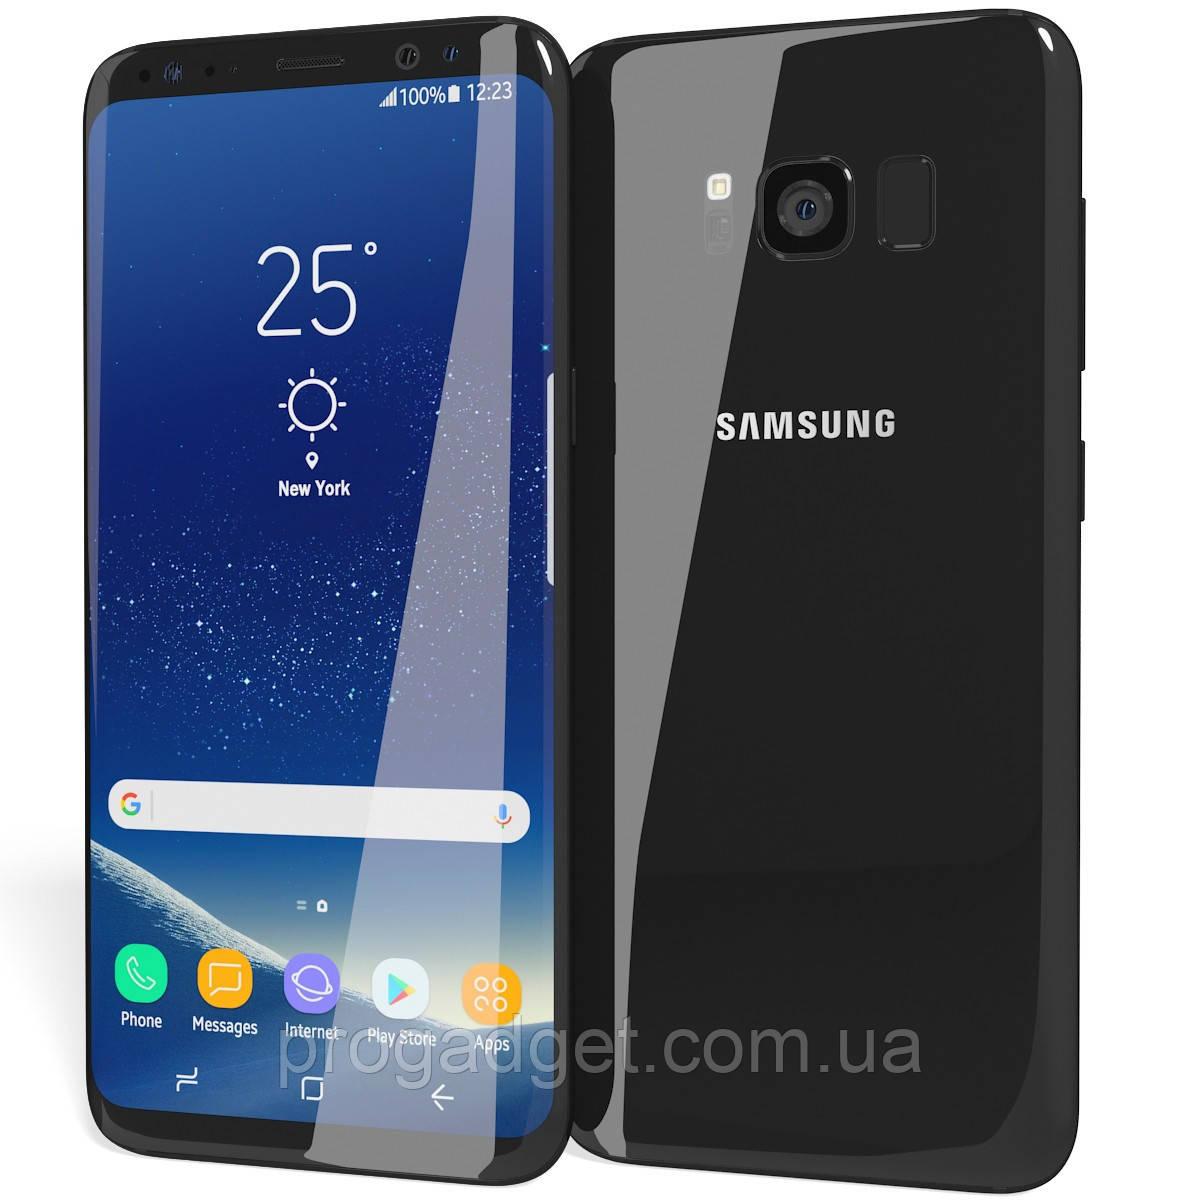 Топ флагман 2018 - Samsung Galaxy S8 SM-G950U1 Midnight Black 4 / 64GB (US Version) 1sim snapdragon 835